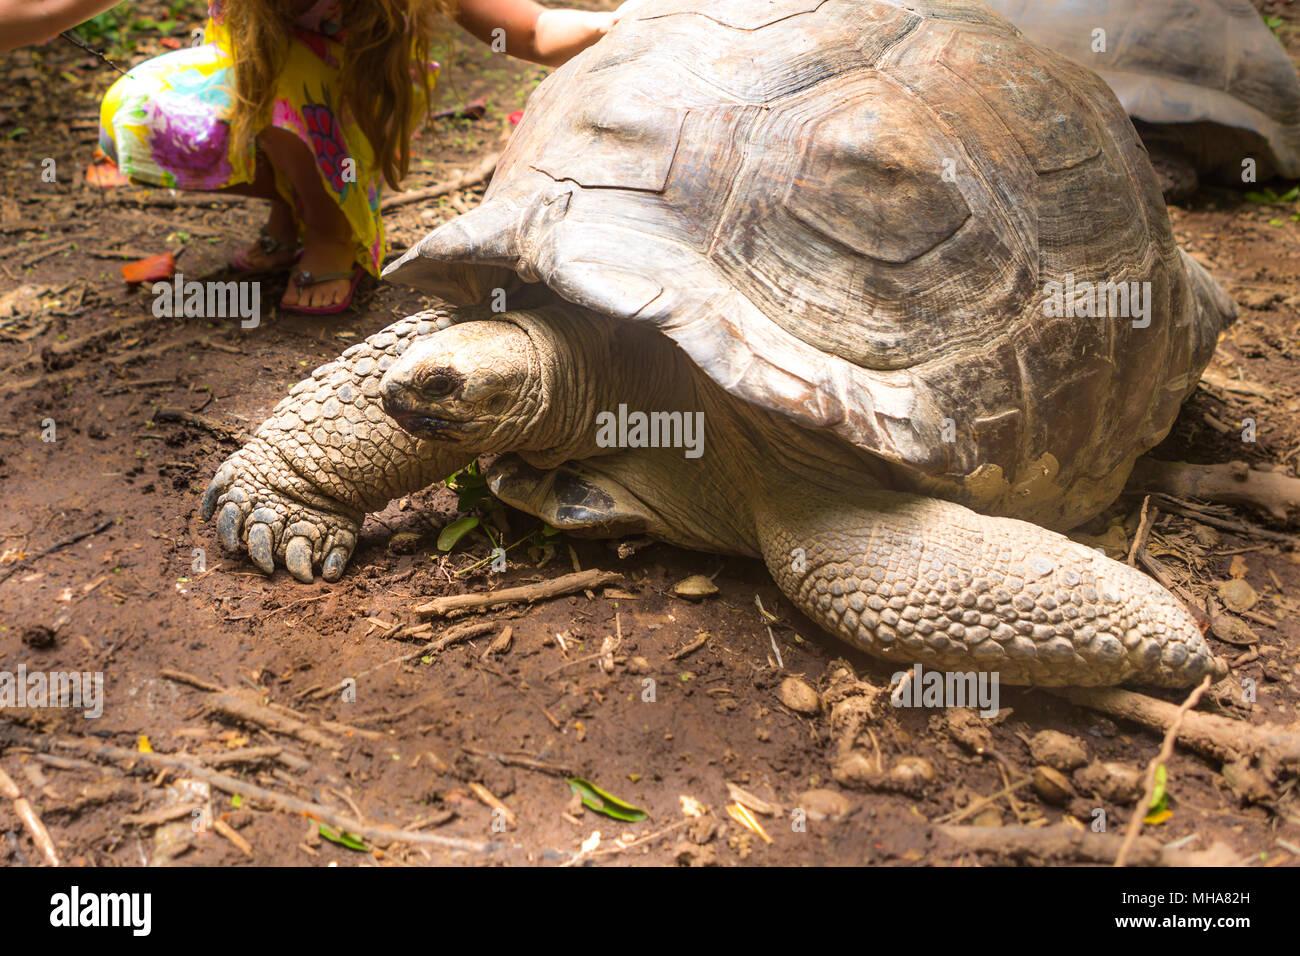 Giant turtles in Island Seychelles. - Stock Image